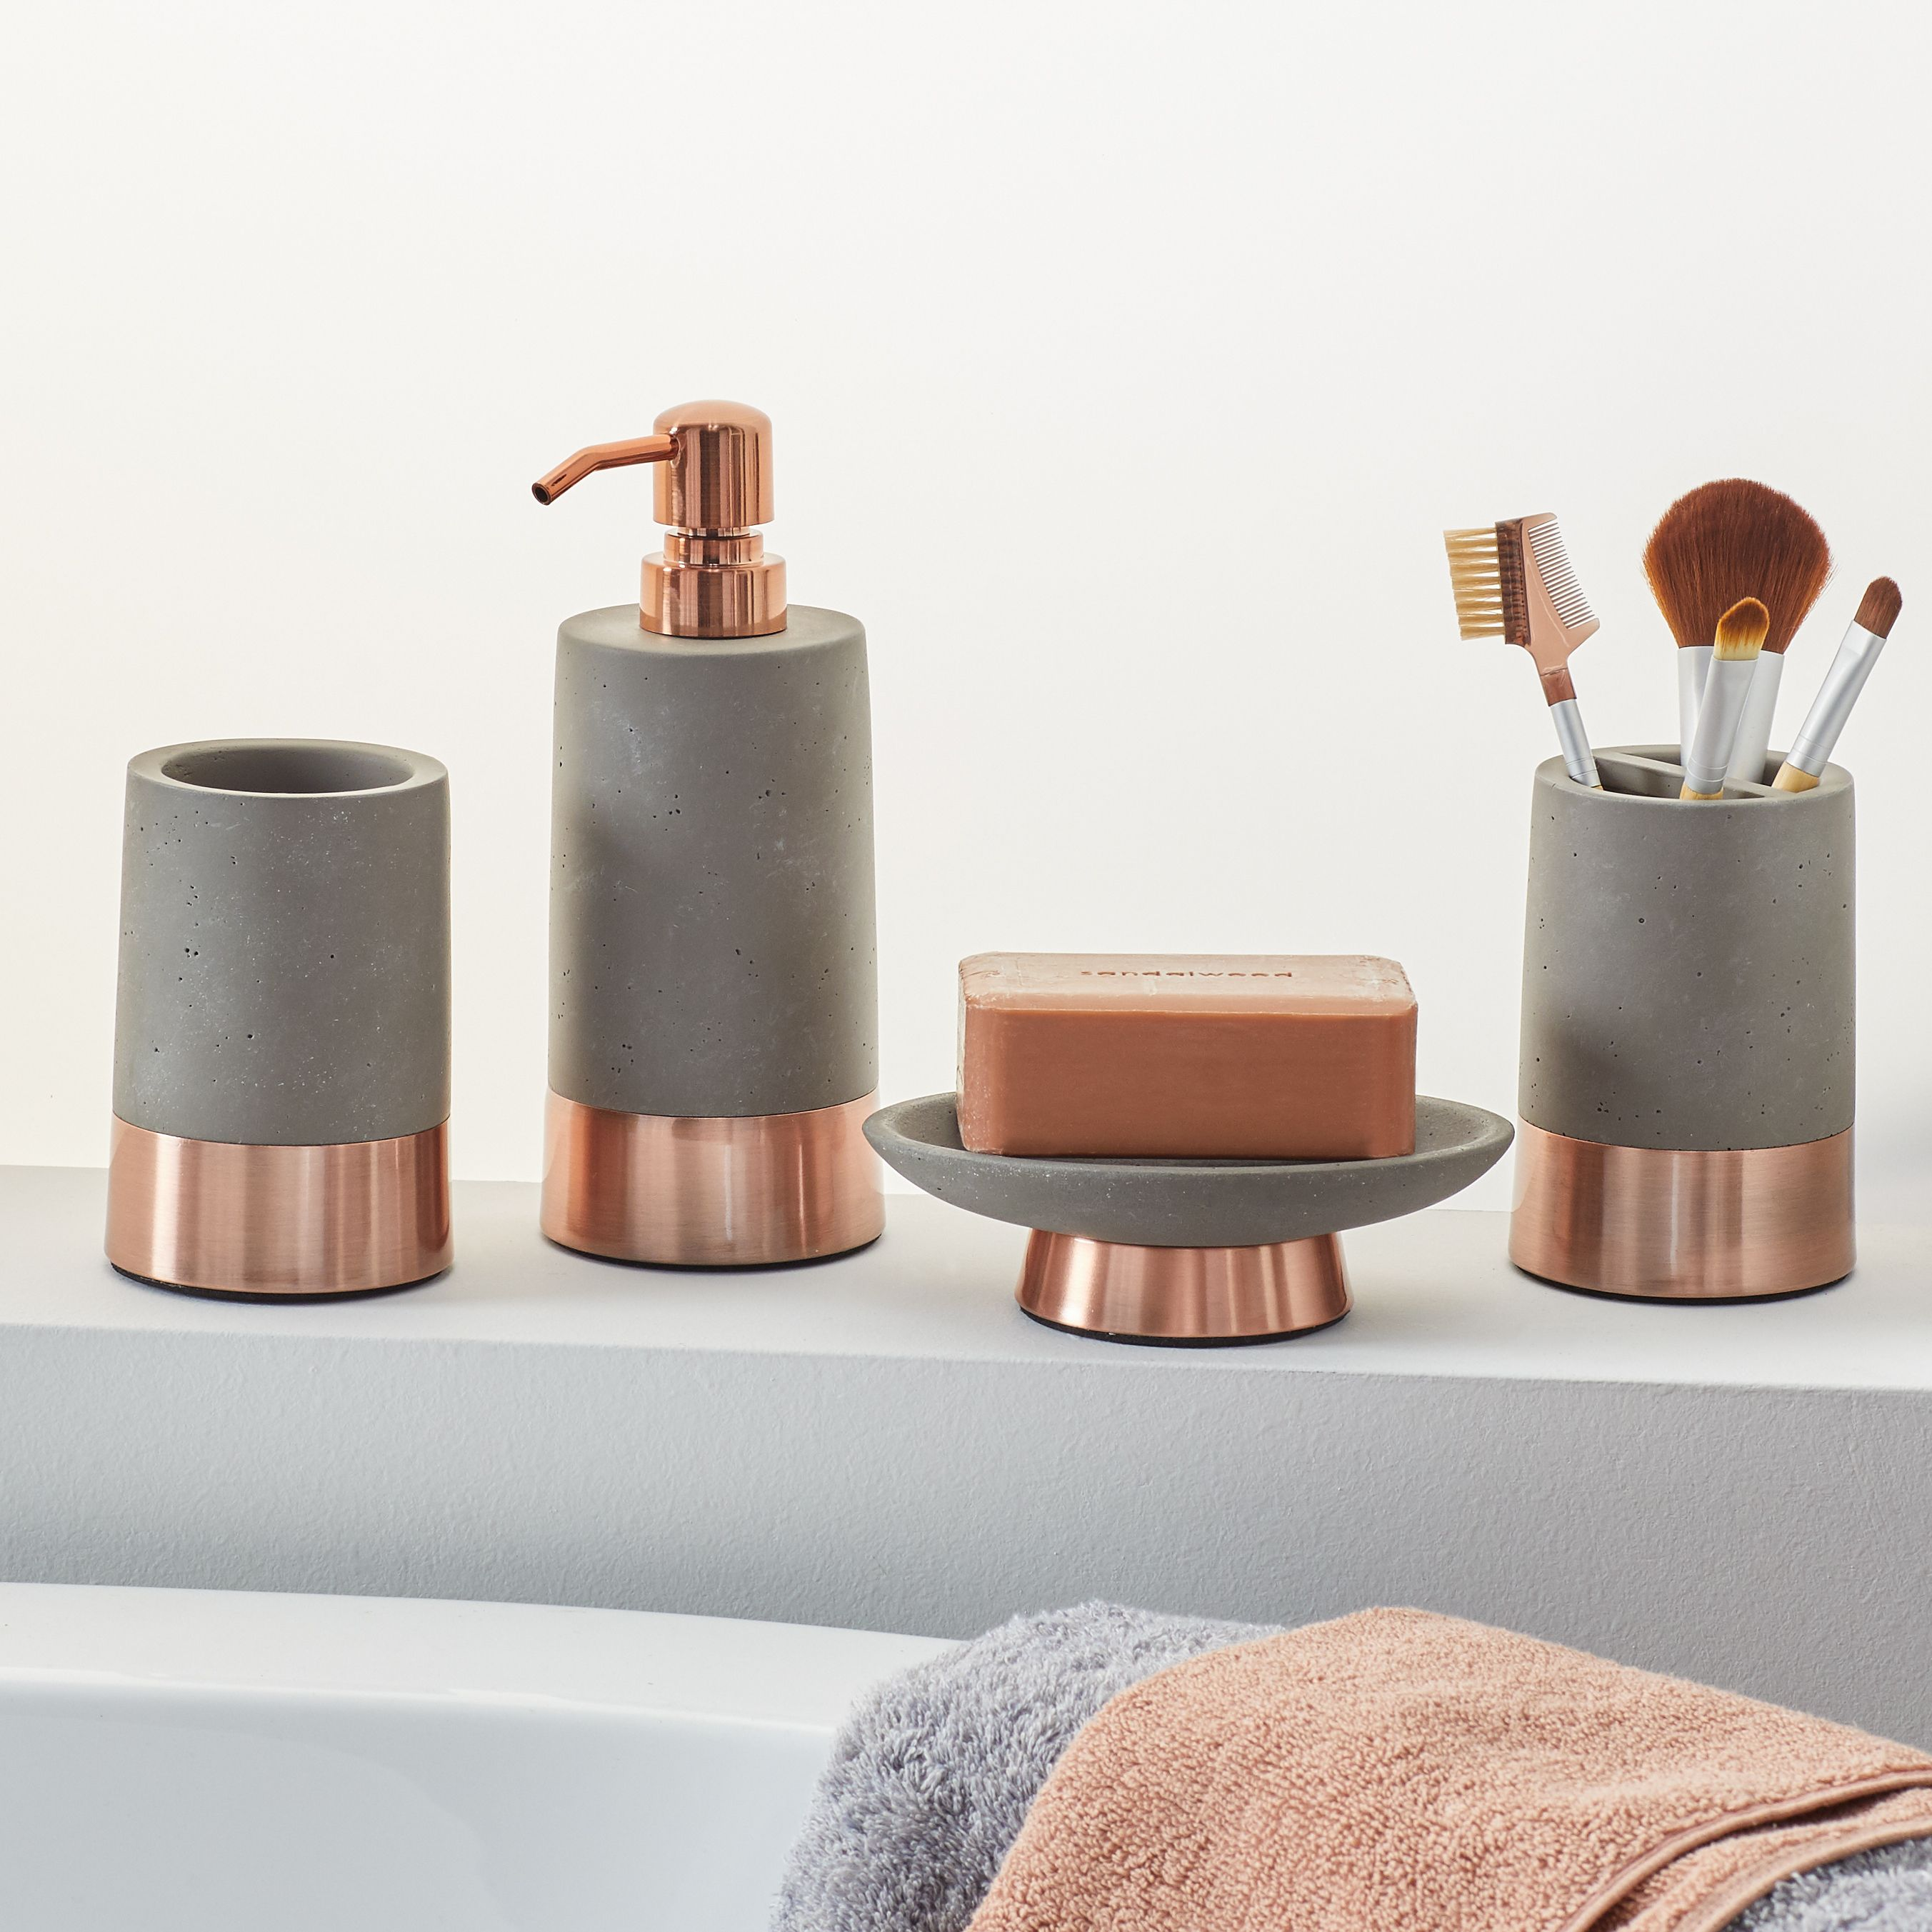 Modrn 4 Piece Concrete With Copper Accent Bath Accessory Set Walmart Com Copper Bathroom Accessories Bath Accessories Set Bath Accessories